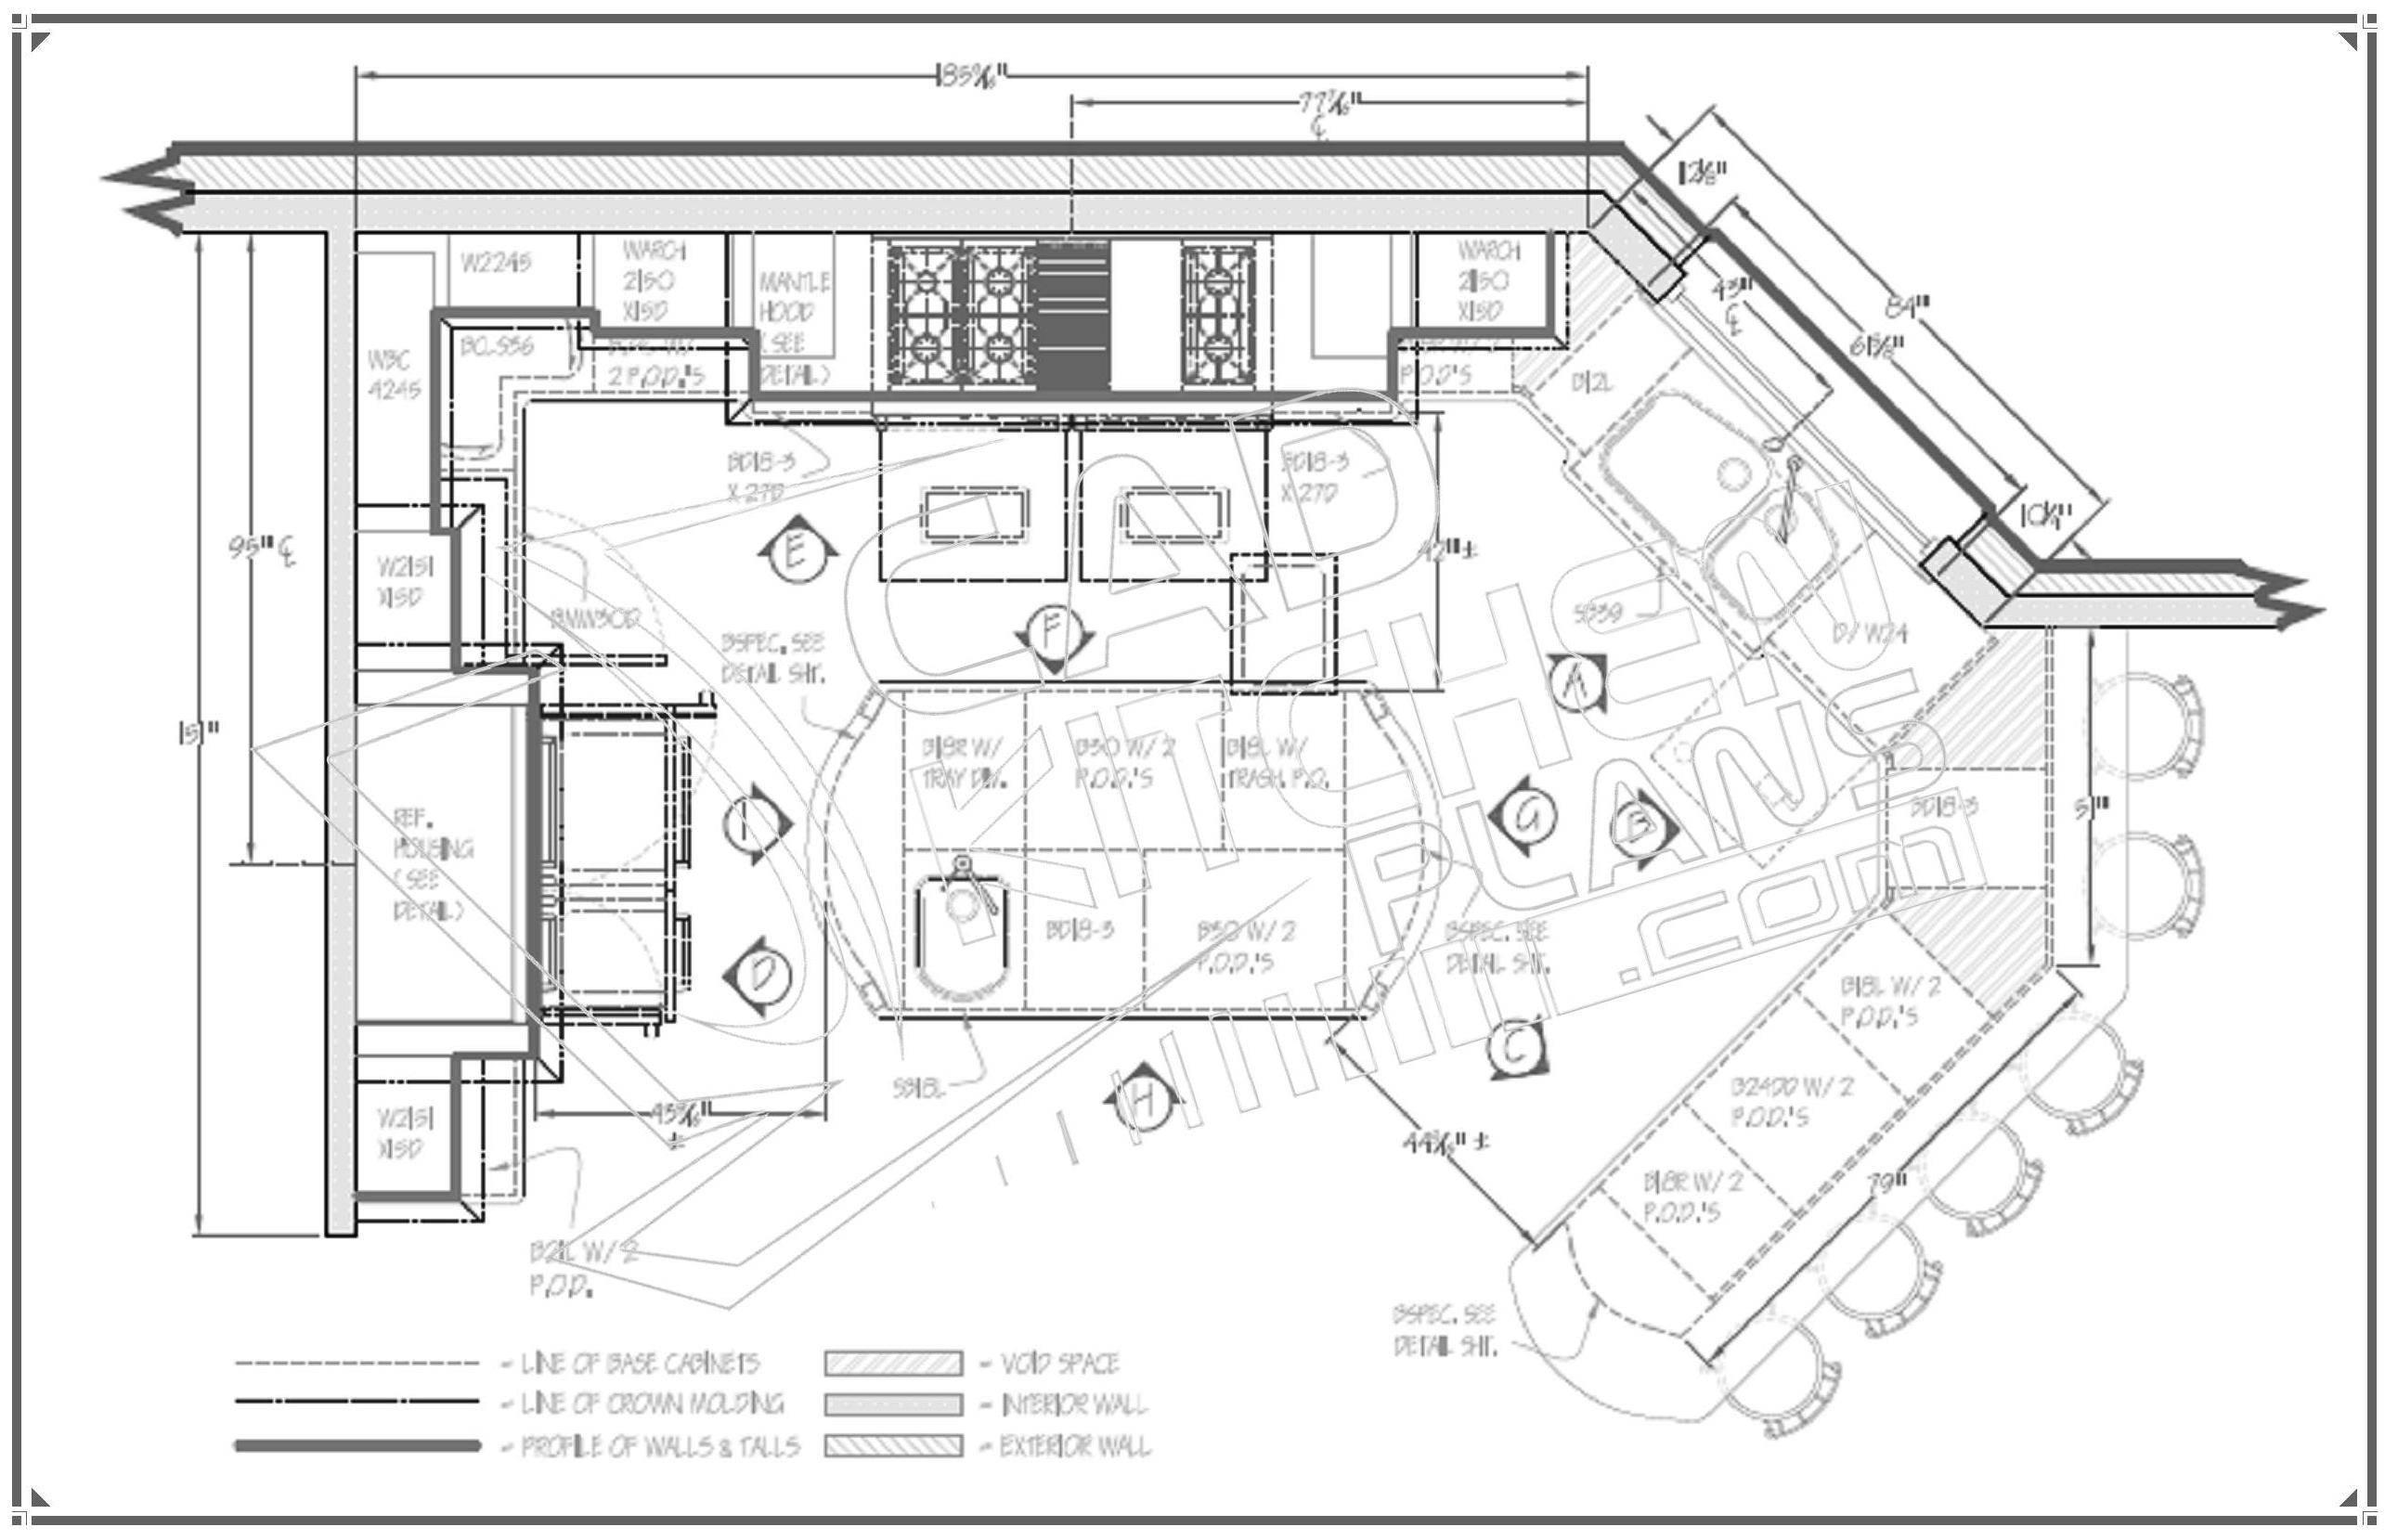 Commercial Kitchen Floor Plan Design House Plans 85748